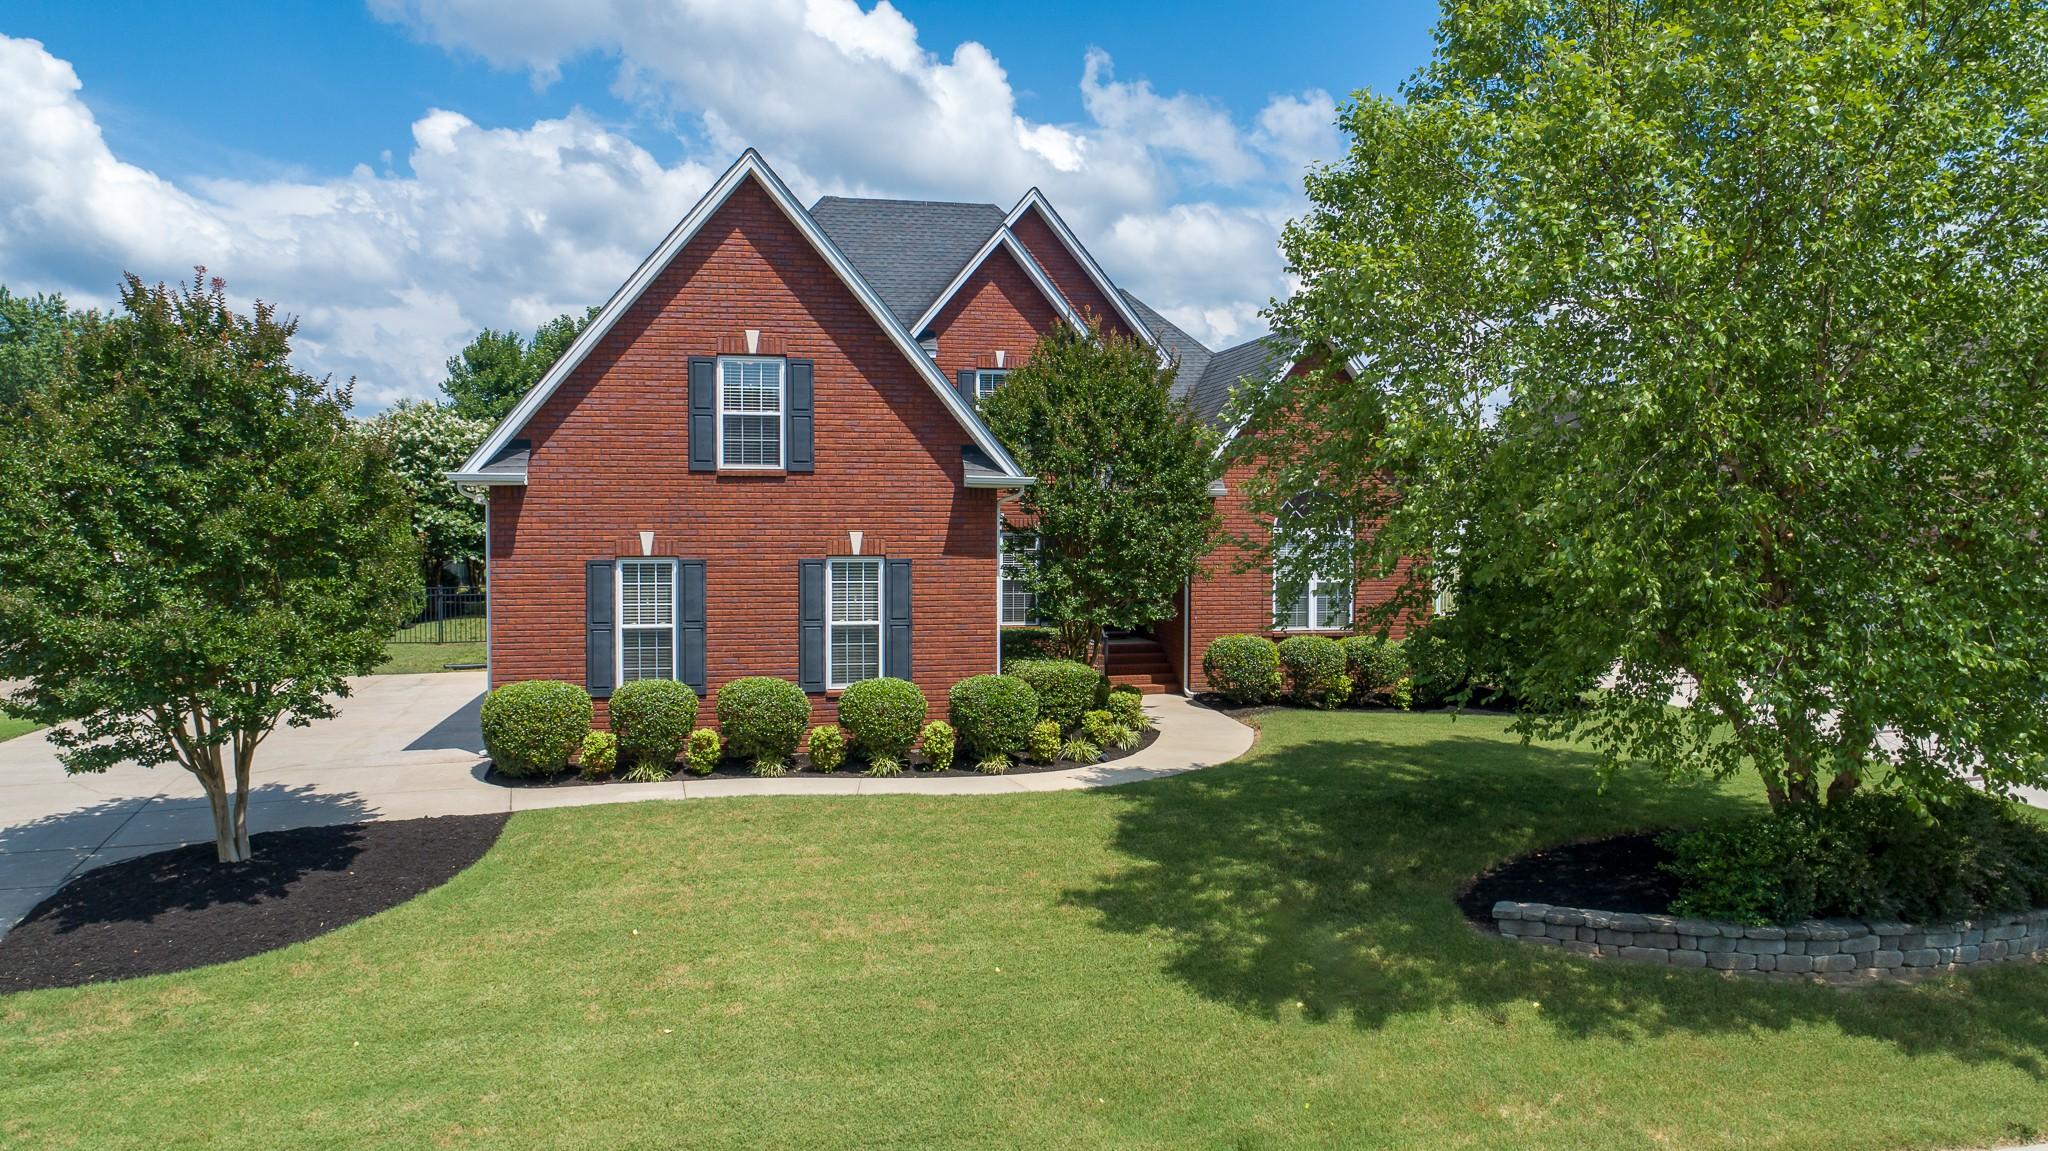 2924 Caraway Dr, Murfreesboro, TN 37130 - Murfreesboro, TN real estate listing